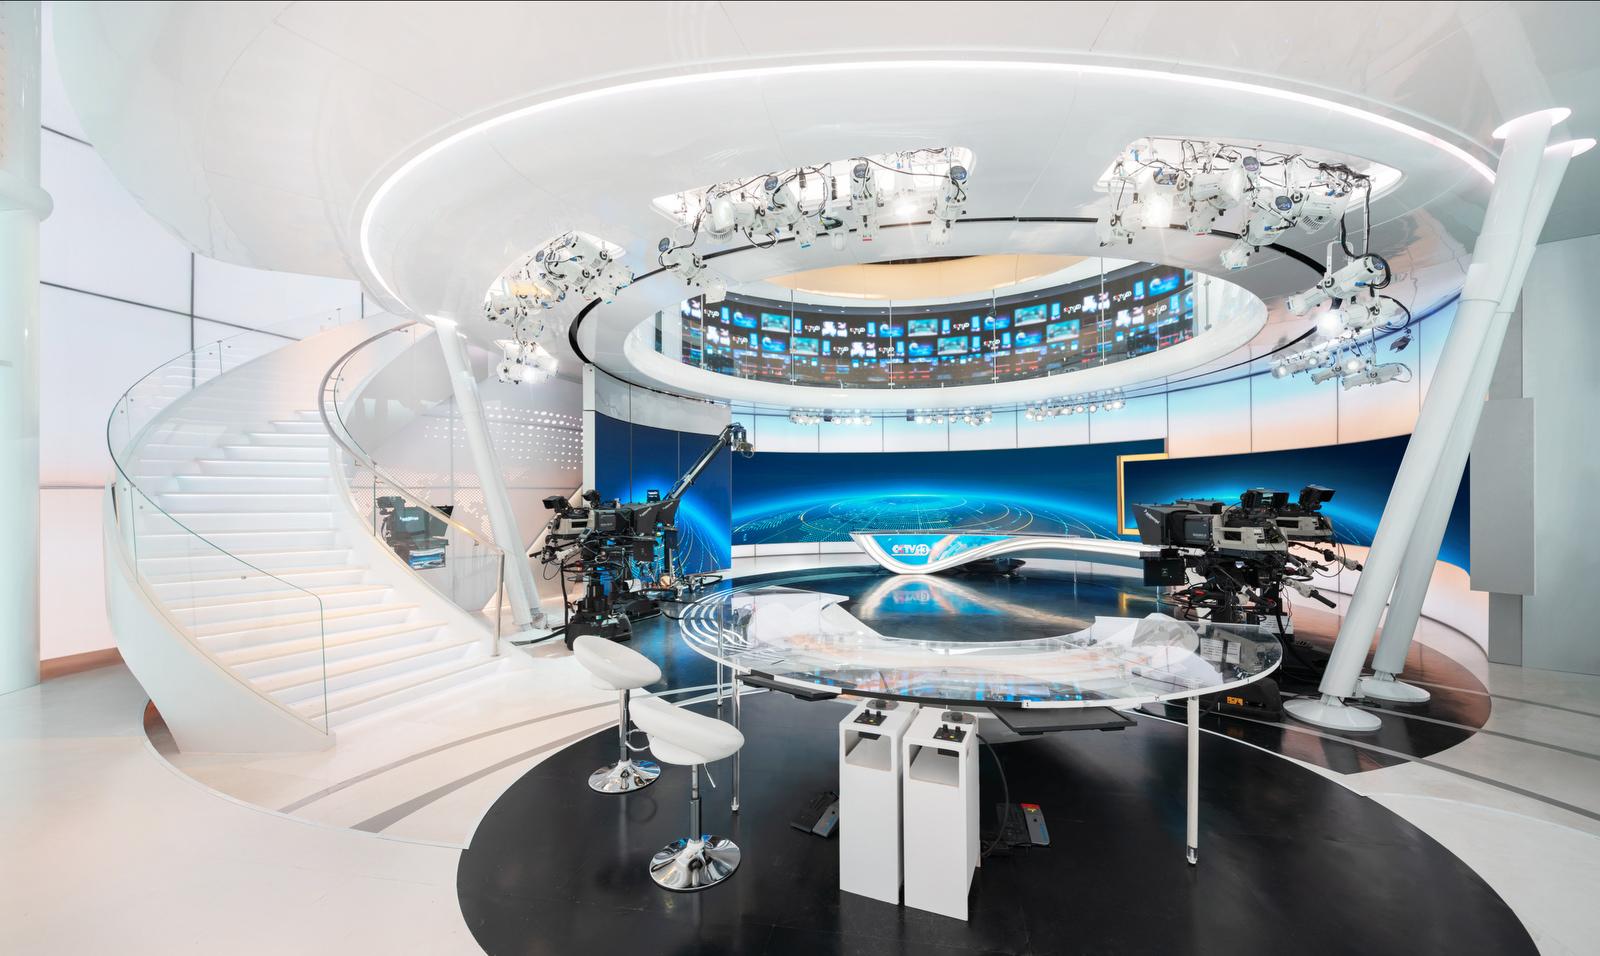 NCS_CCTV13-Set-Design_Clickspring_0005